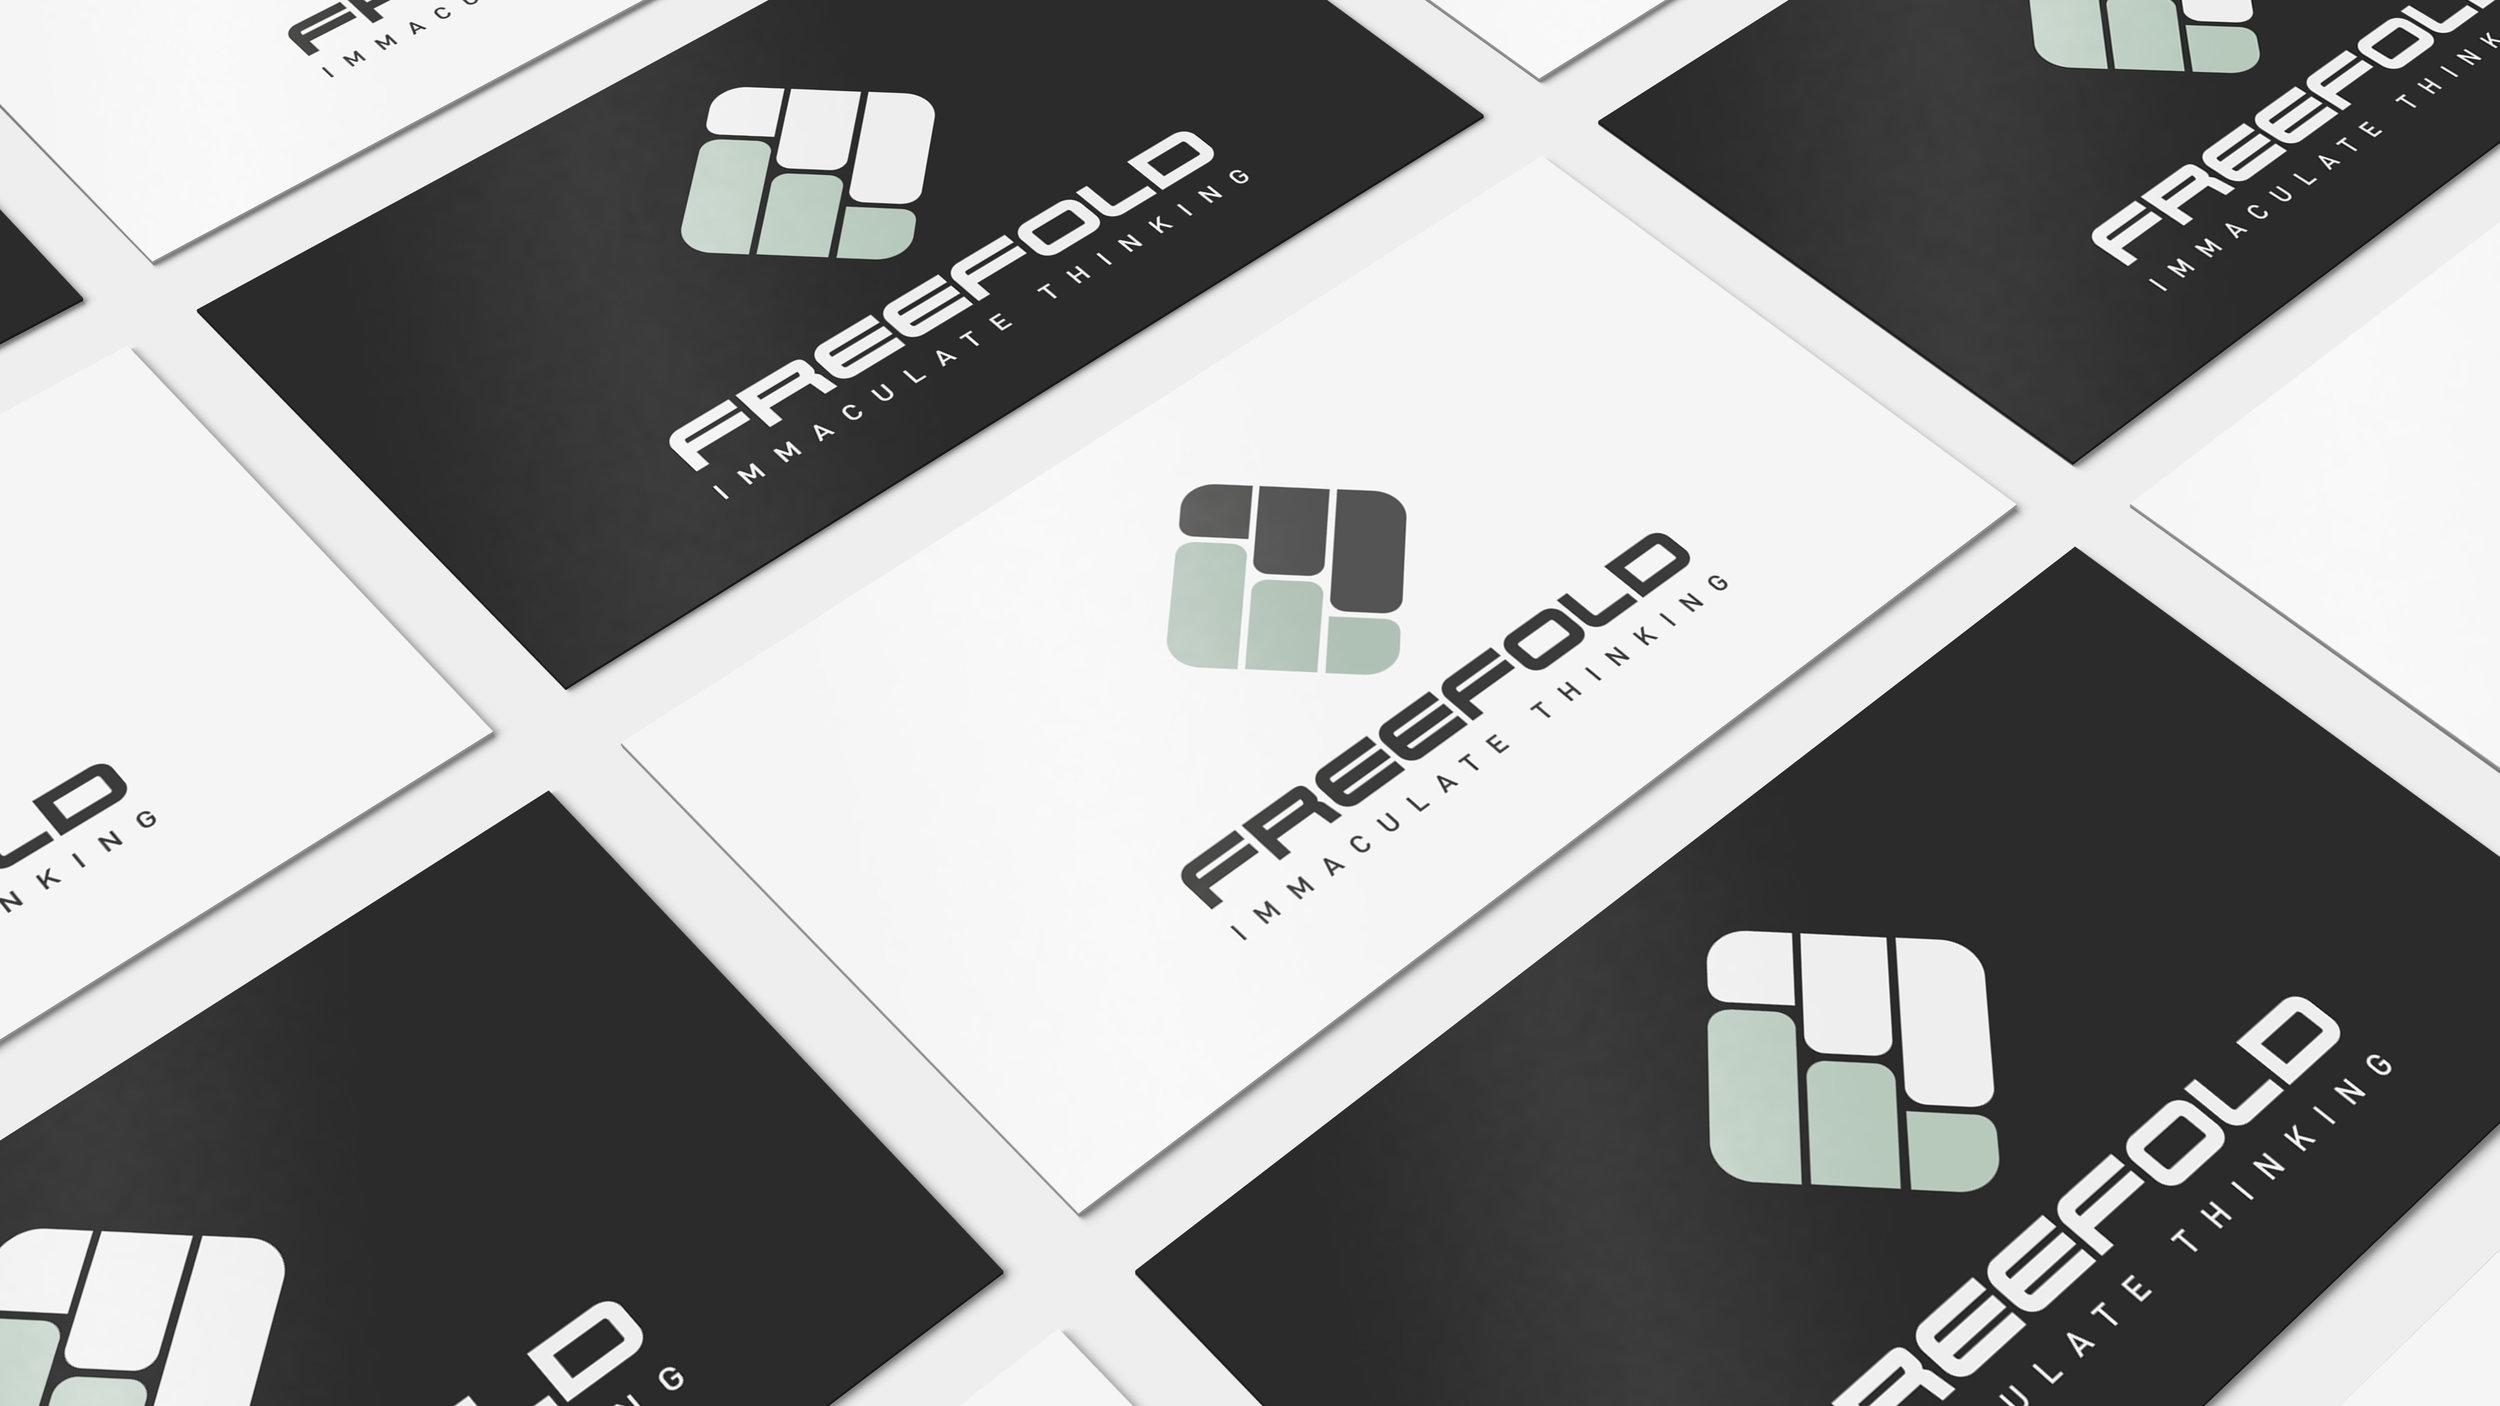 Brand_republica_logo_design_freefold_business_cards.jpg